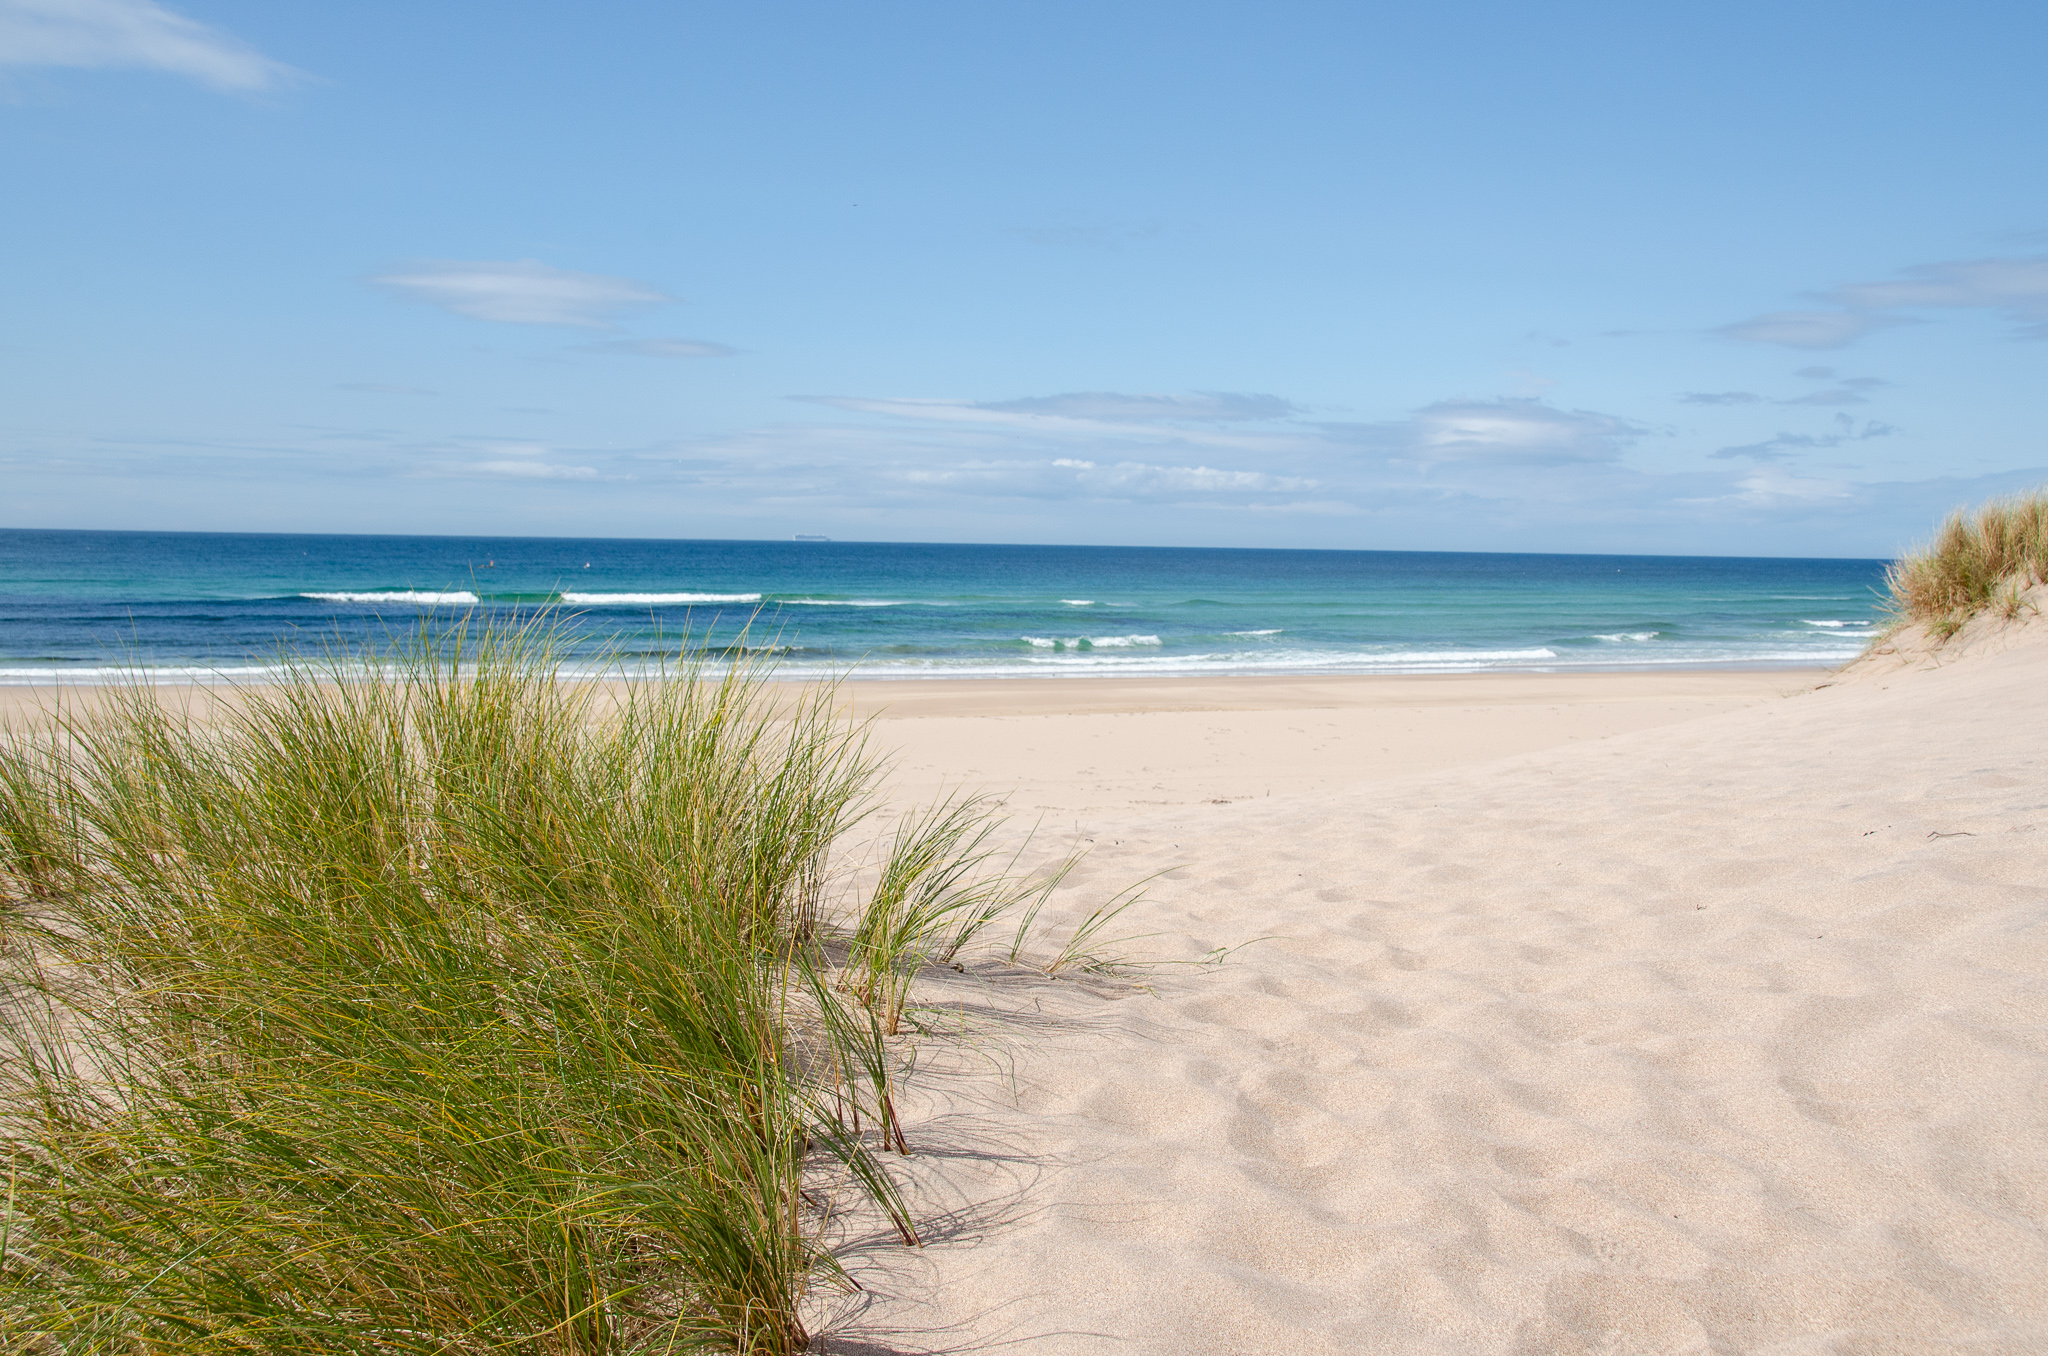 the mile long beach at Sandwood Bay